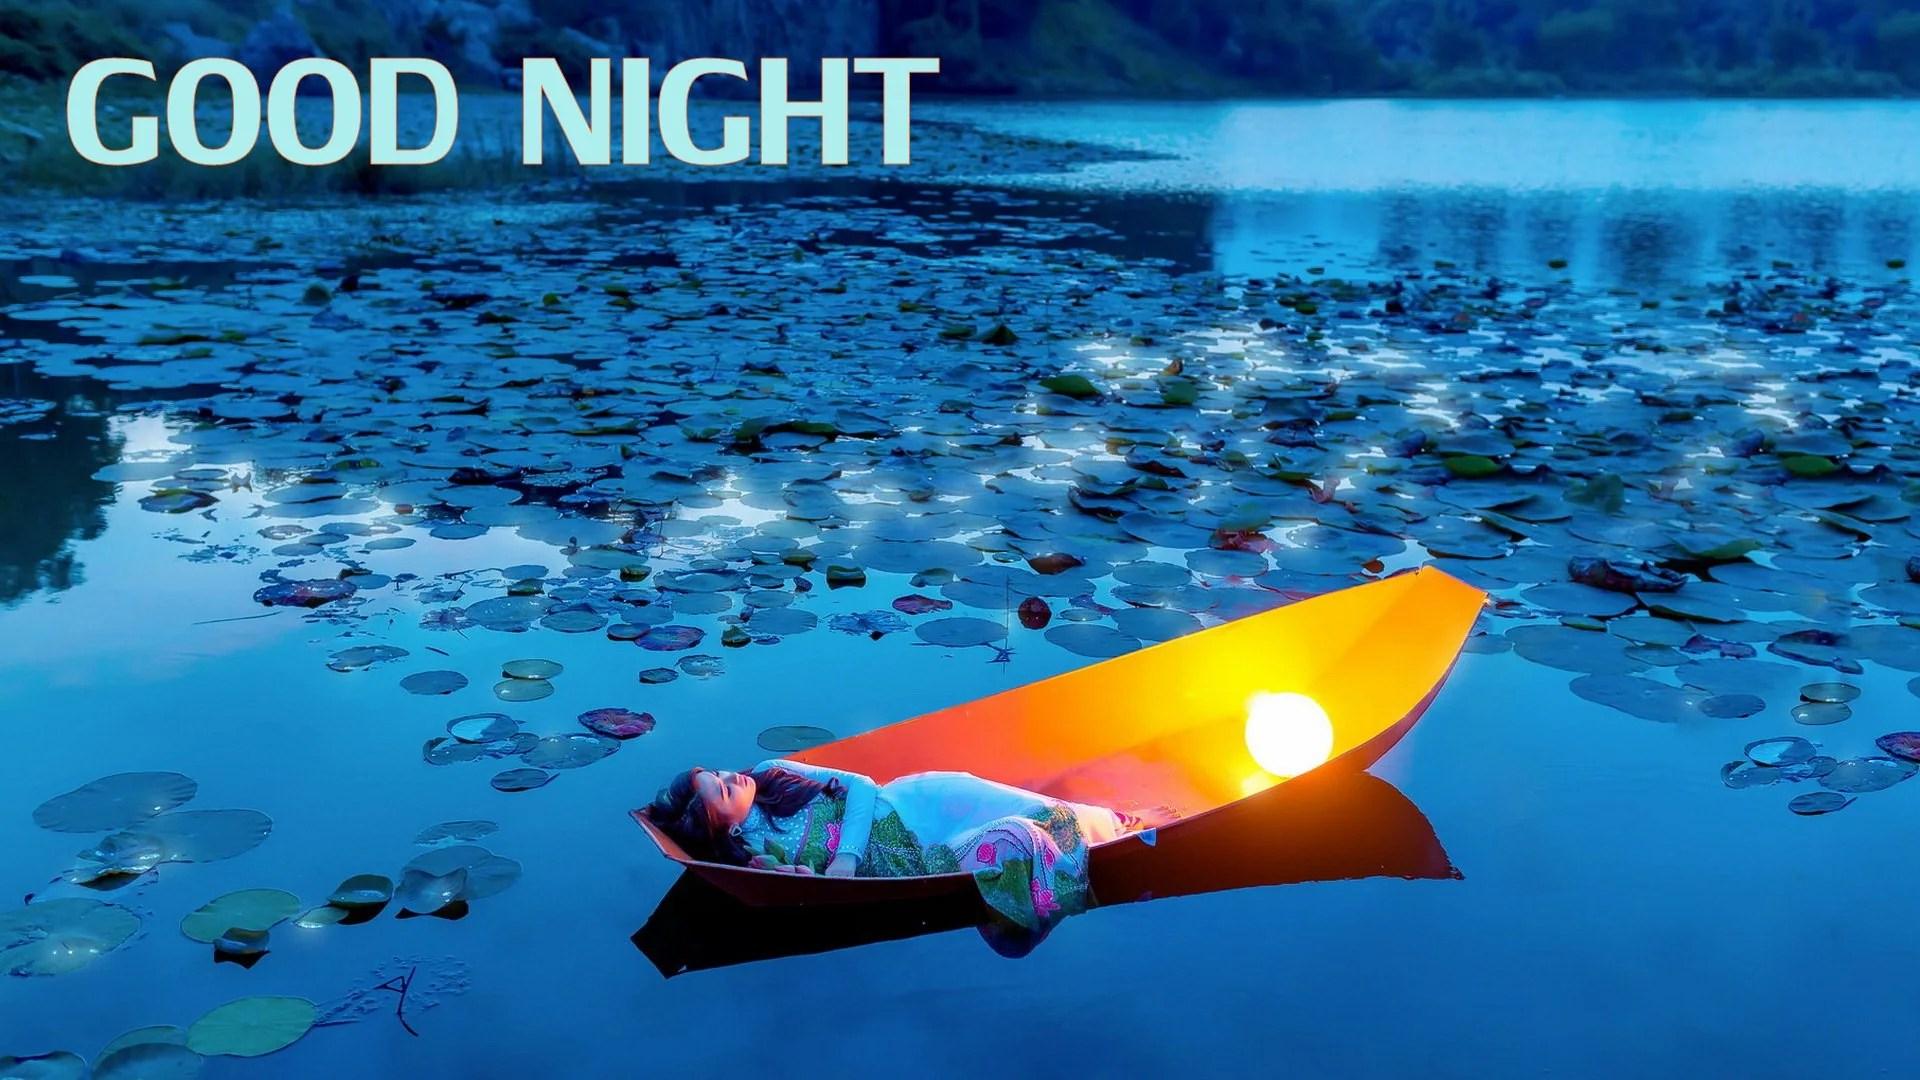 good night lake girl cute image